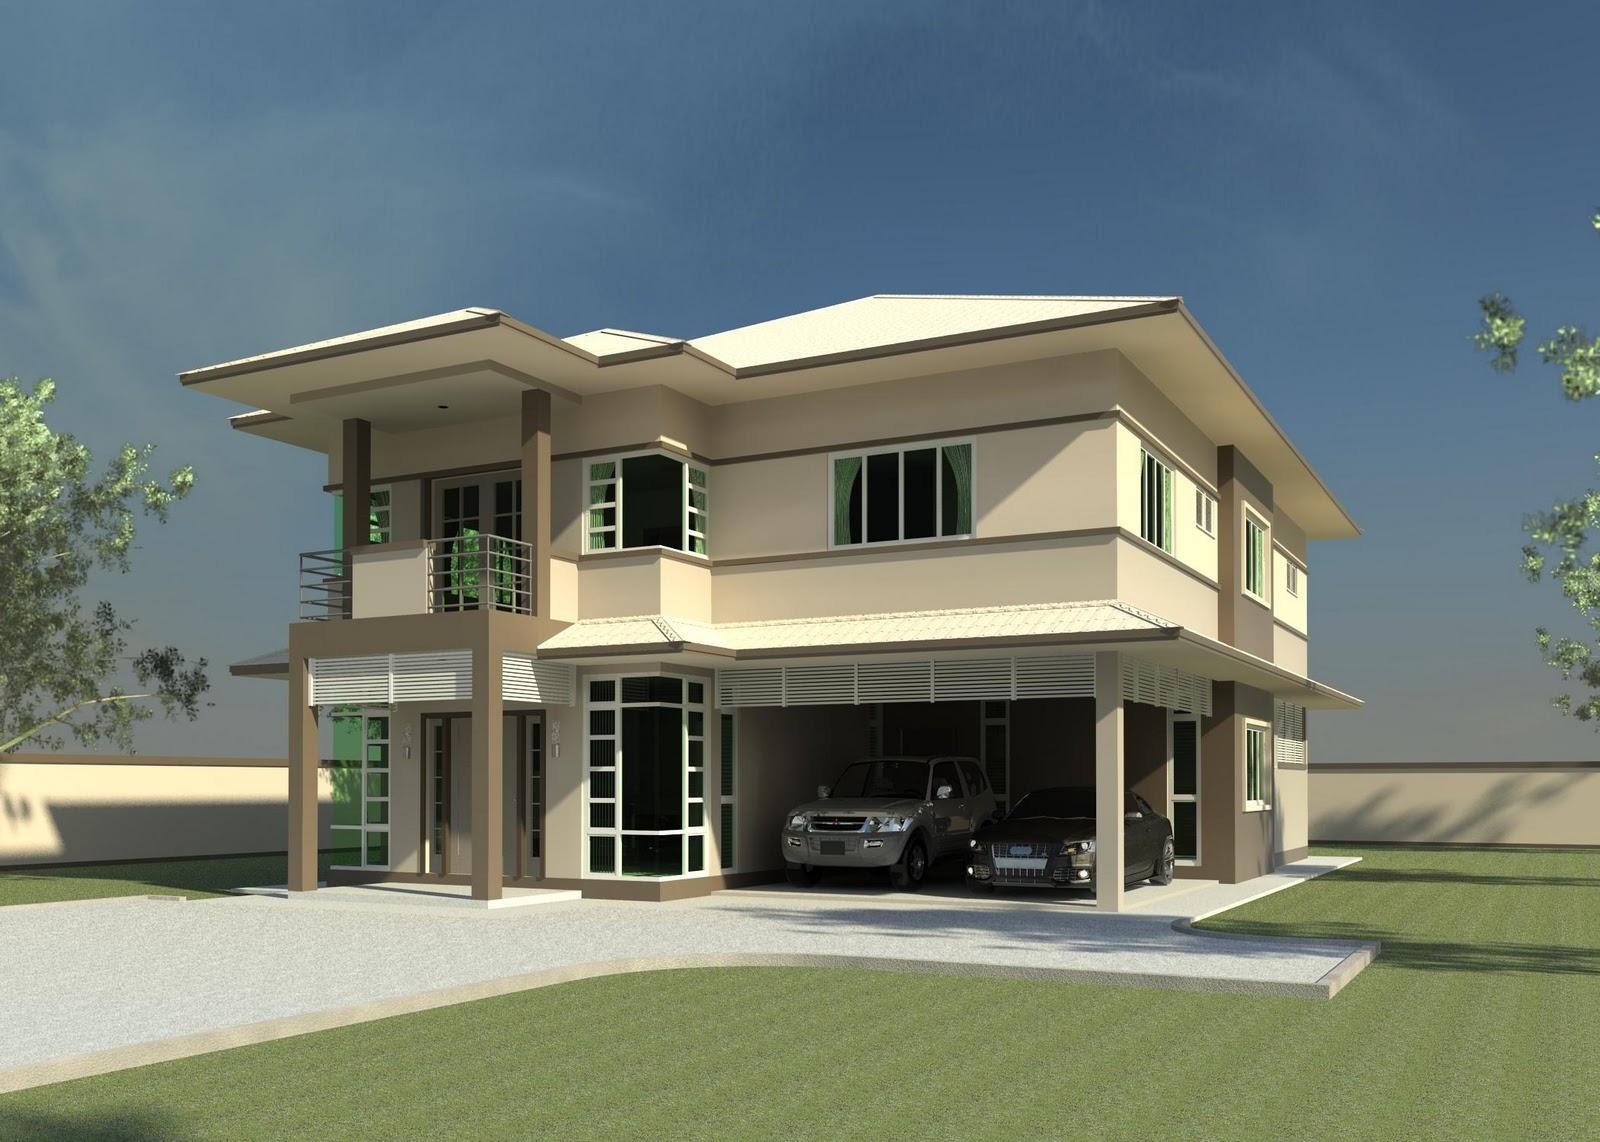 Khalid Rahman Design: 5 Bedrooms + 6 Bathrooms; Double